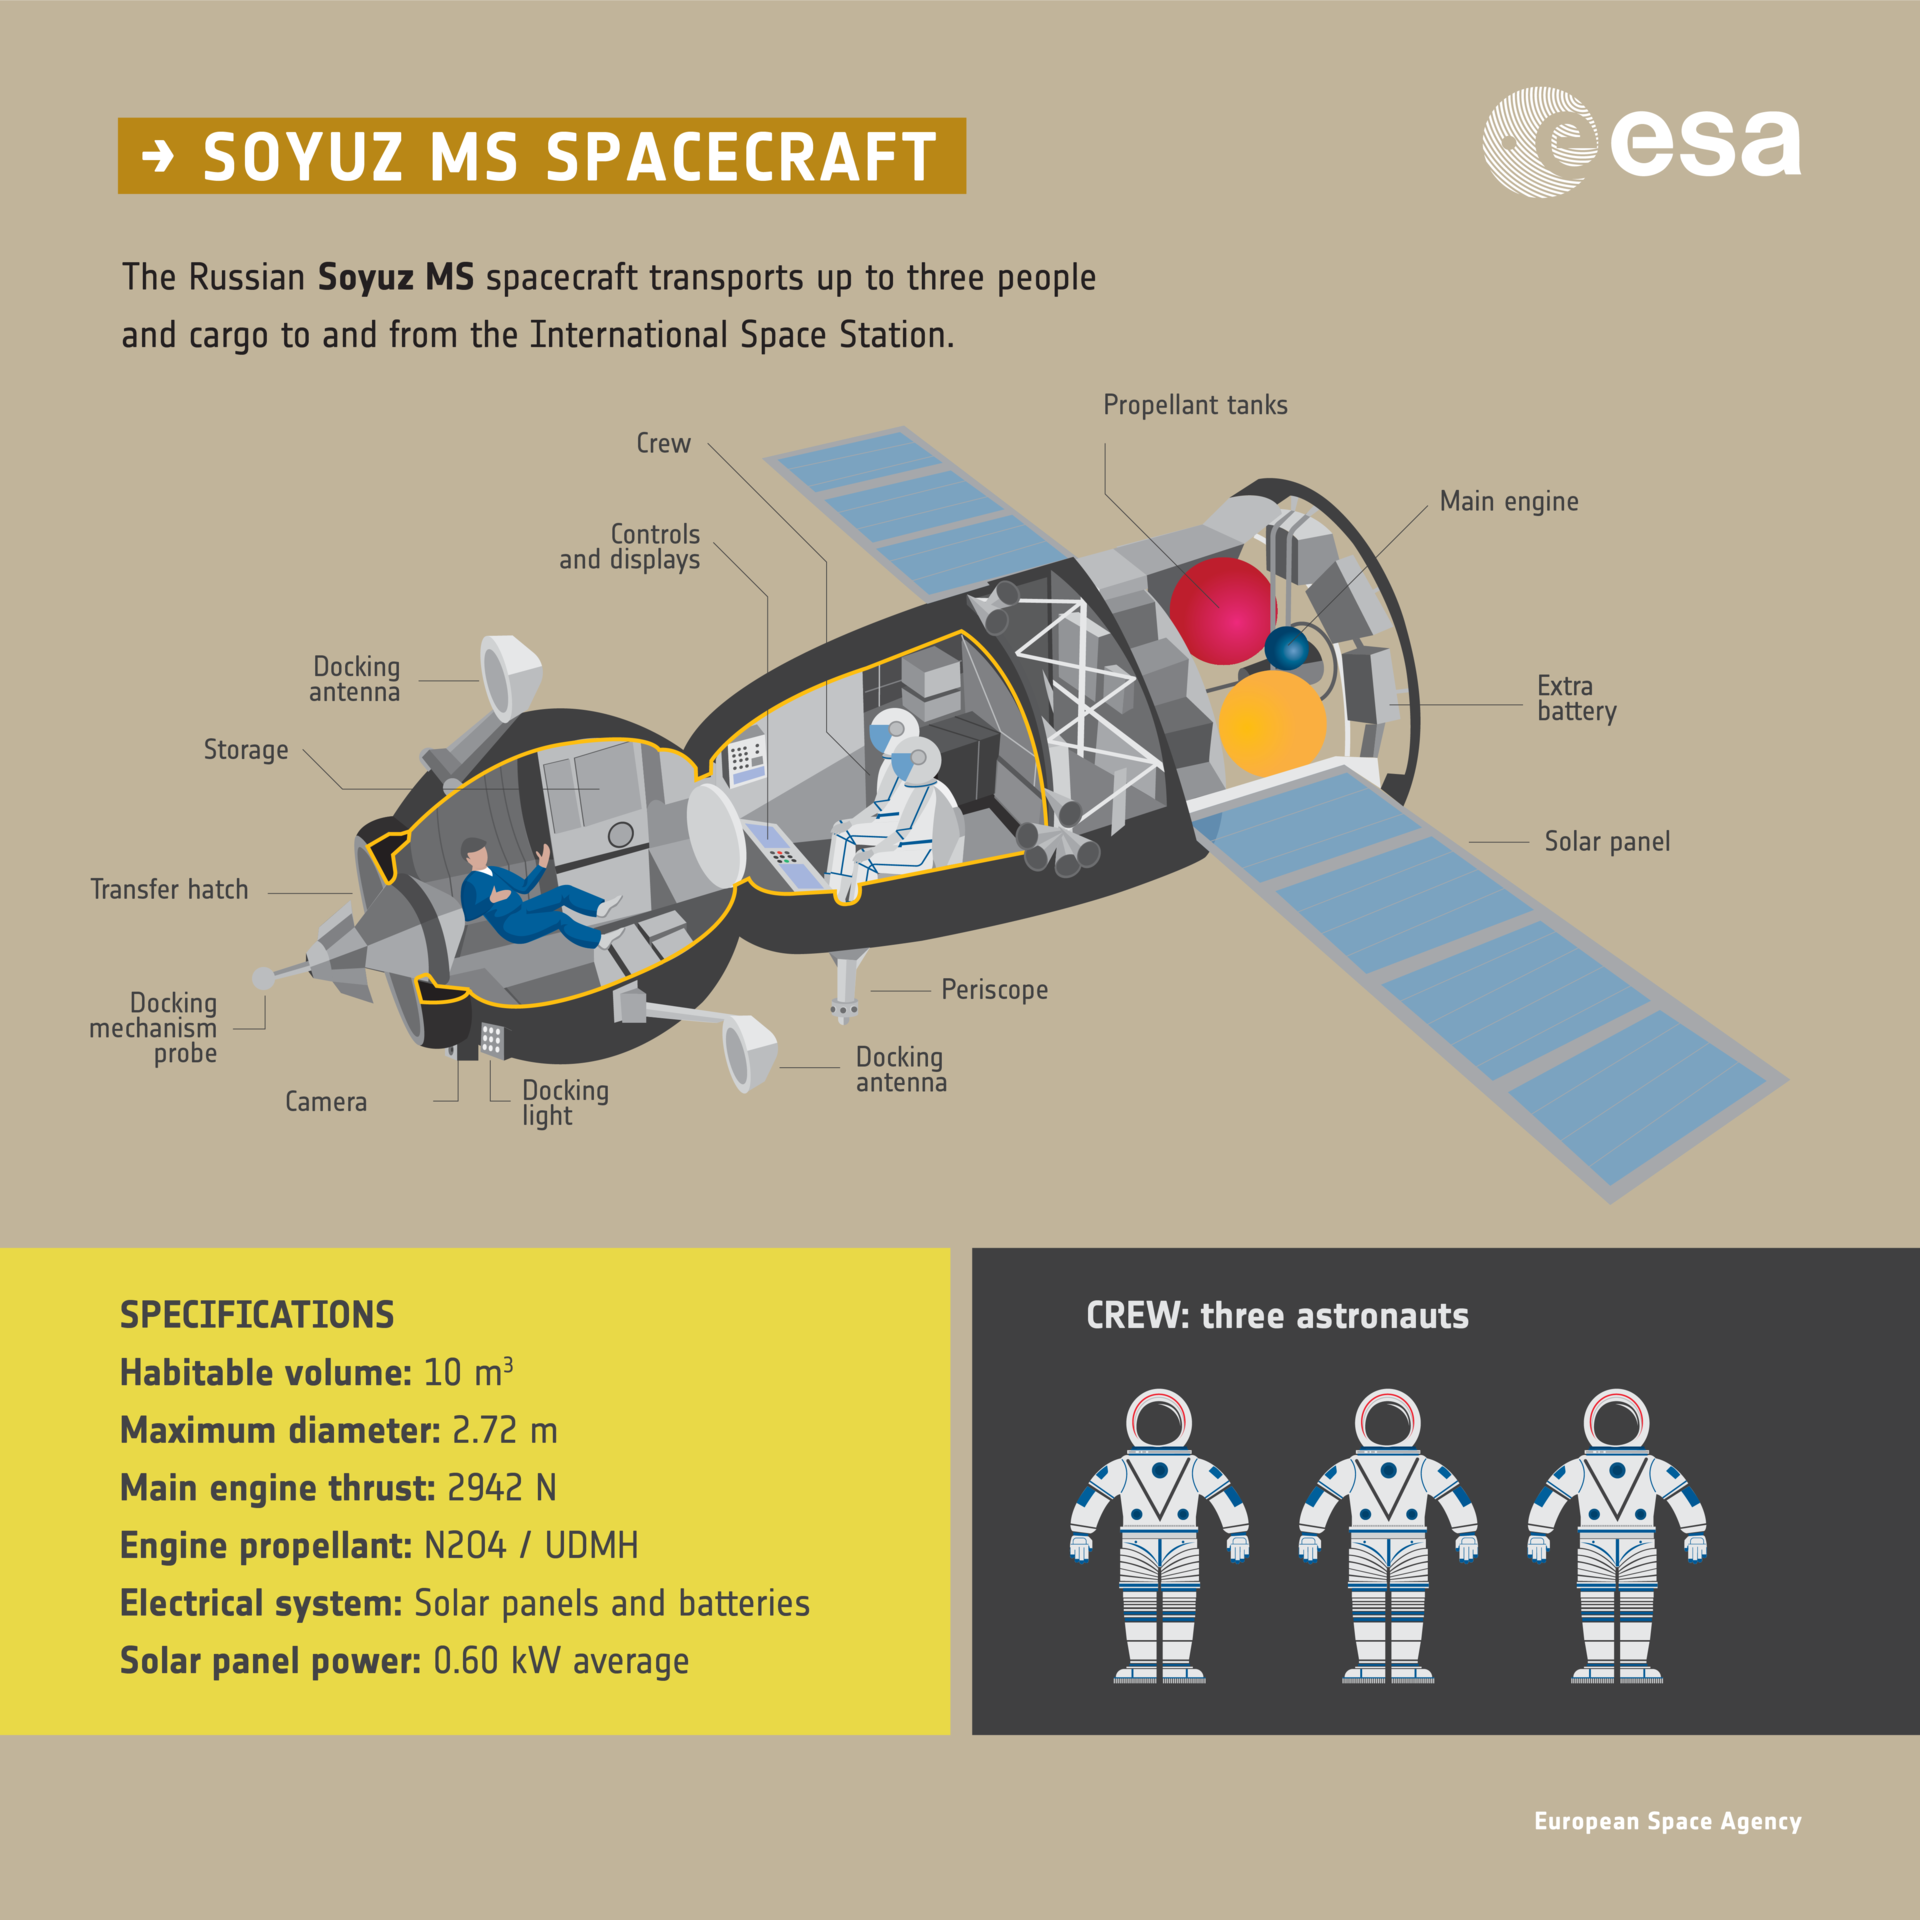 Soyuz MS spacecraft infographic pillars